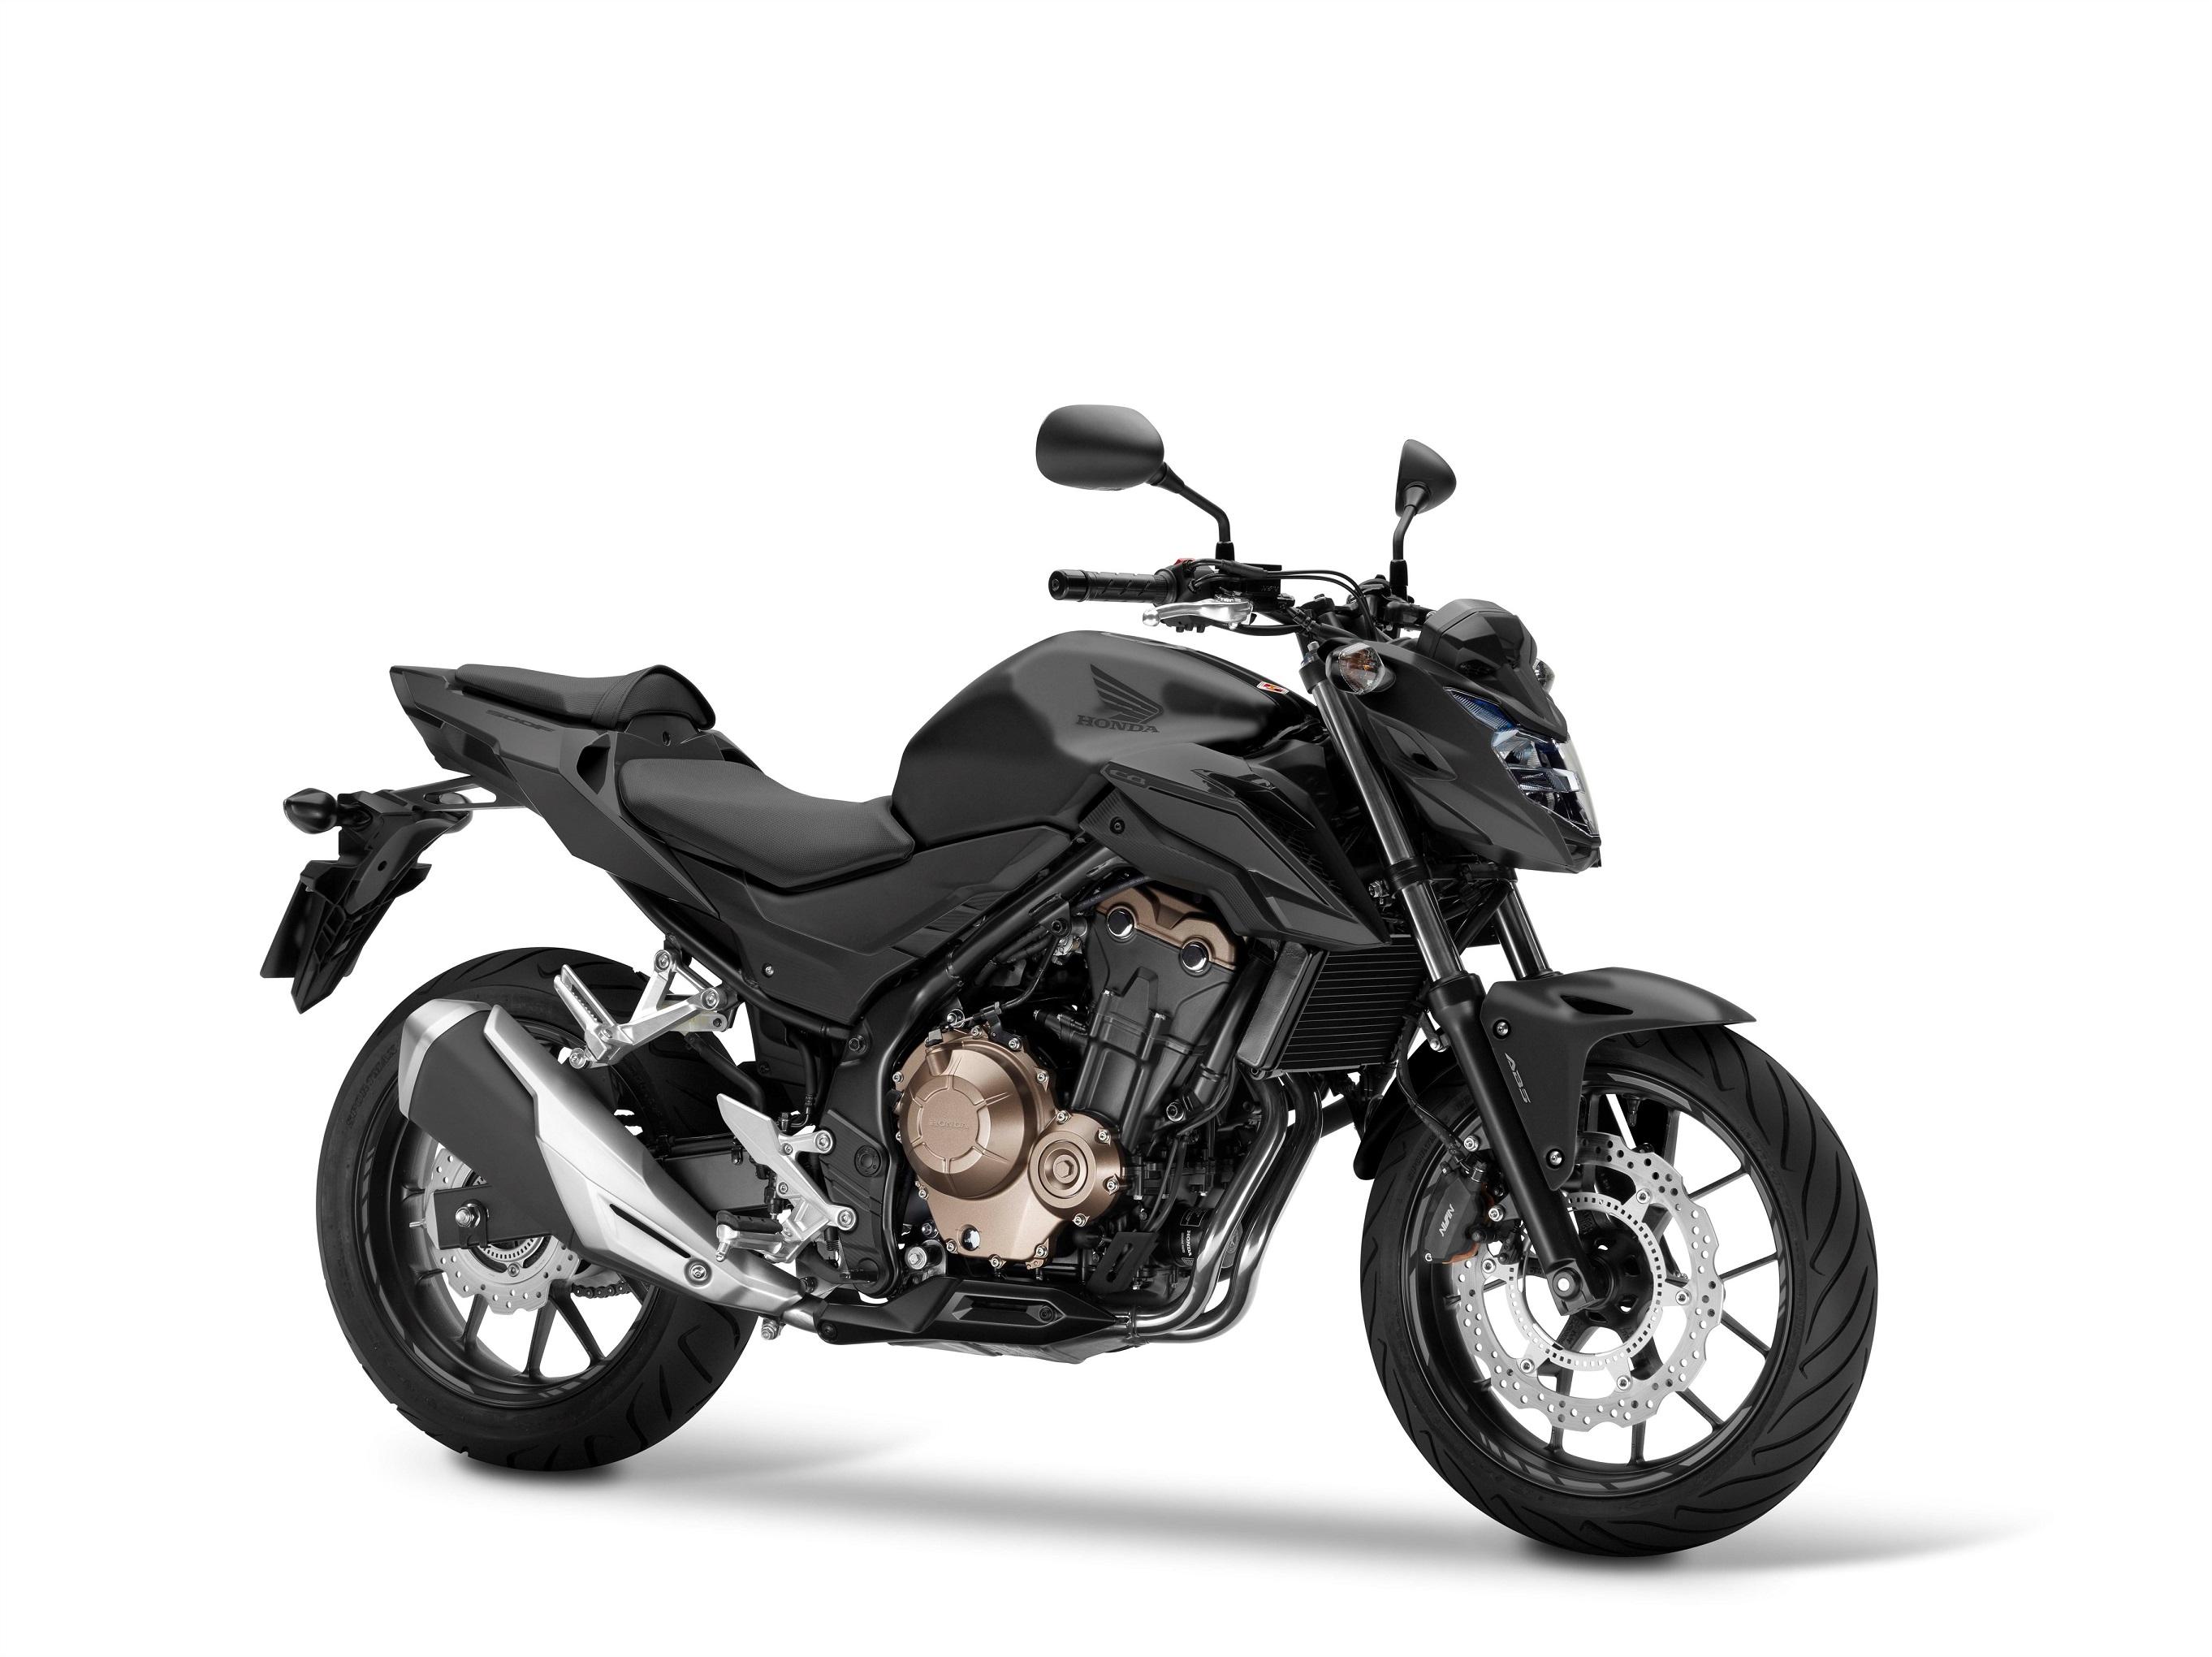 naked bike Honda CB500F 2017